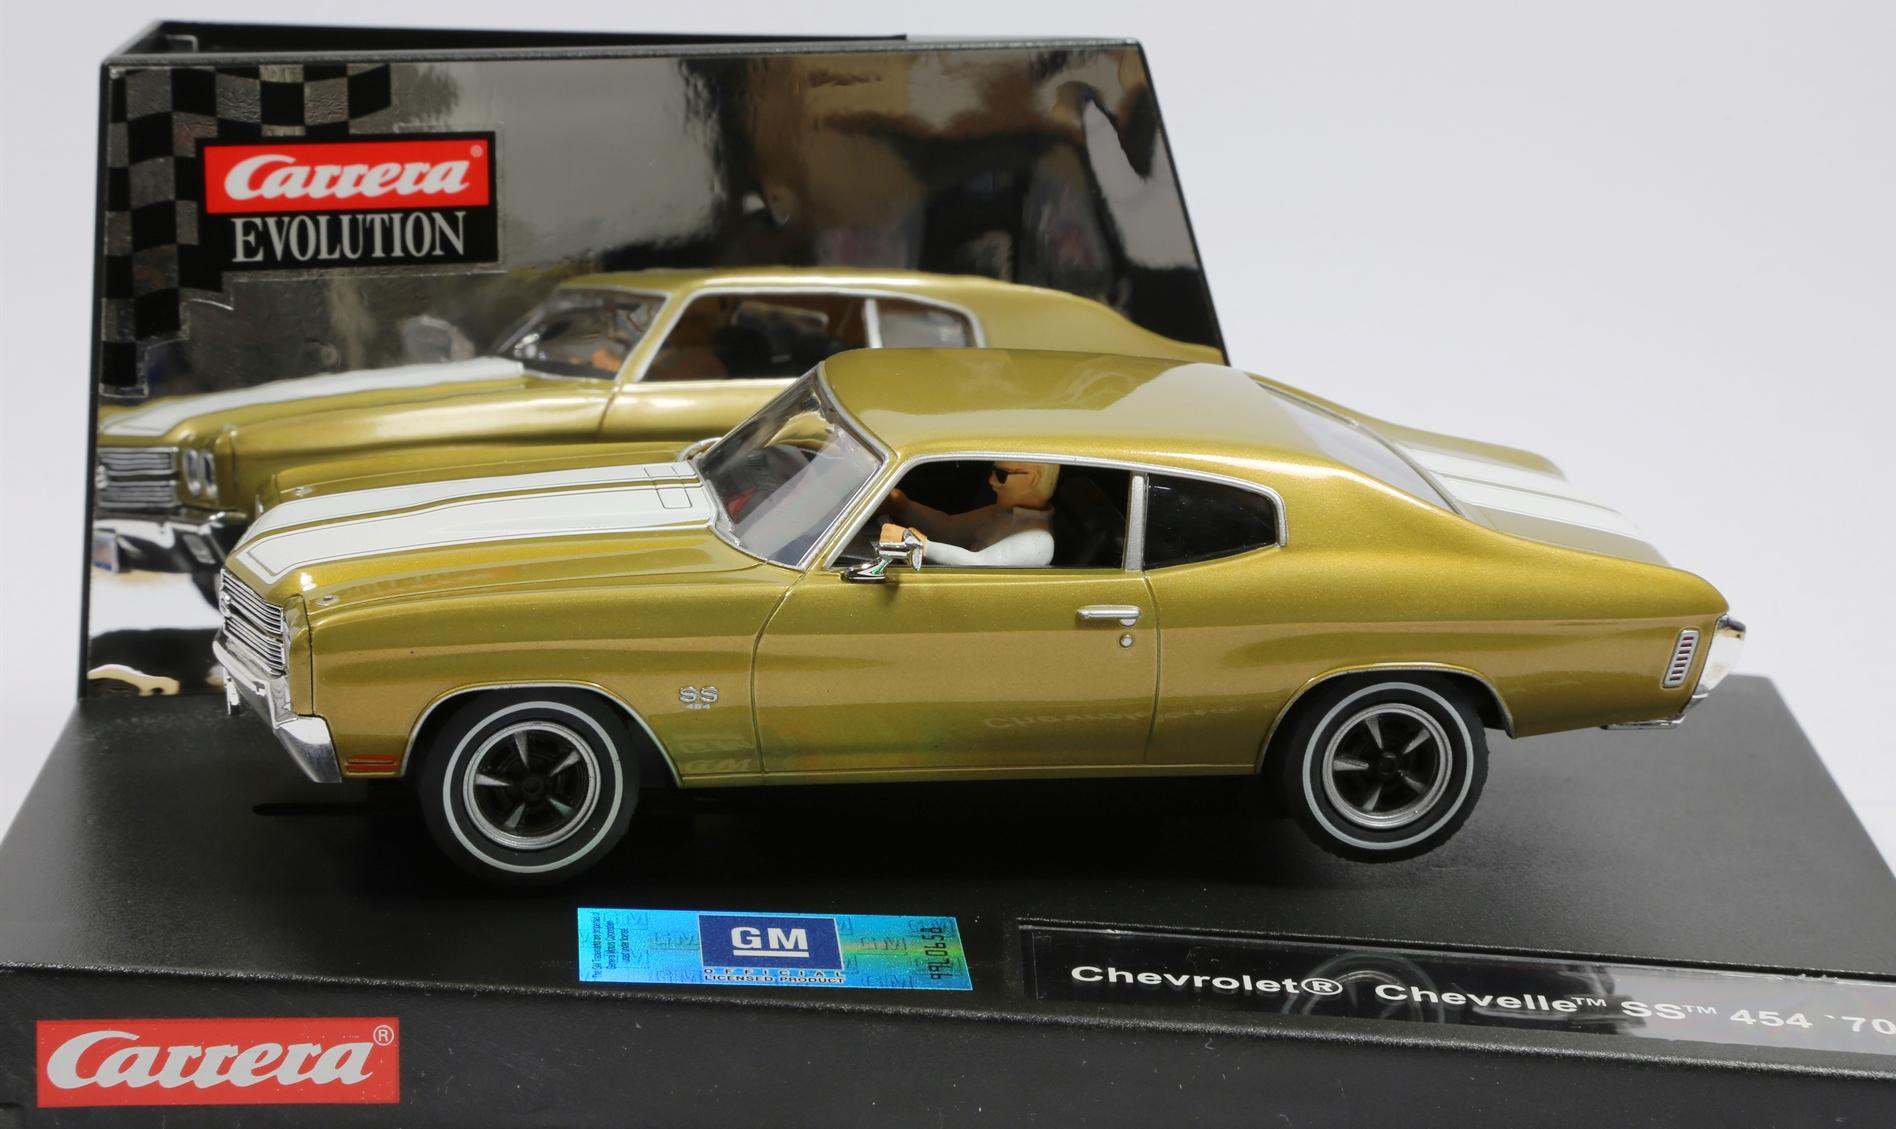 Chevrolette Chevelle SS 454 '70 19.99€